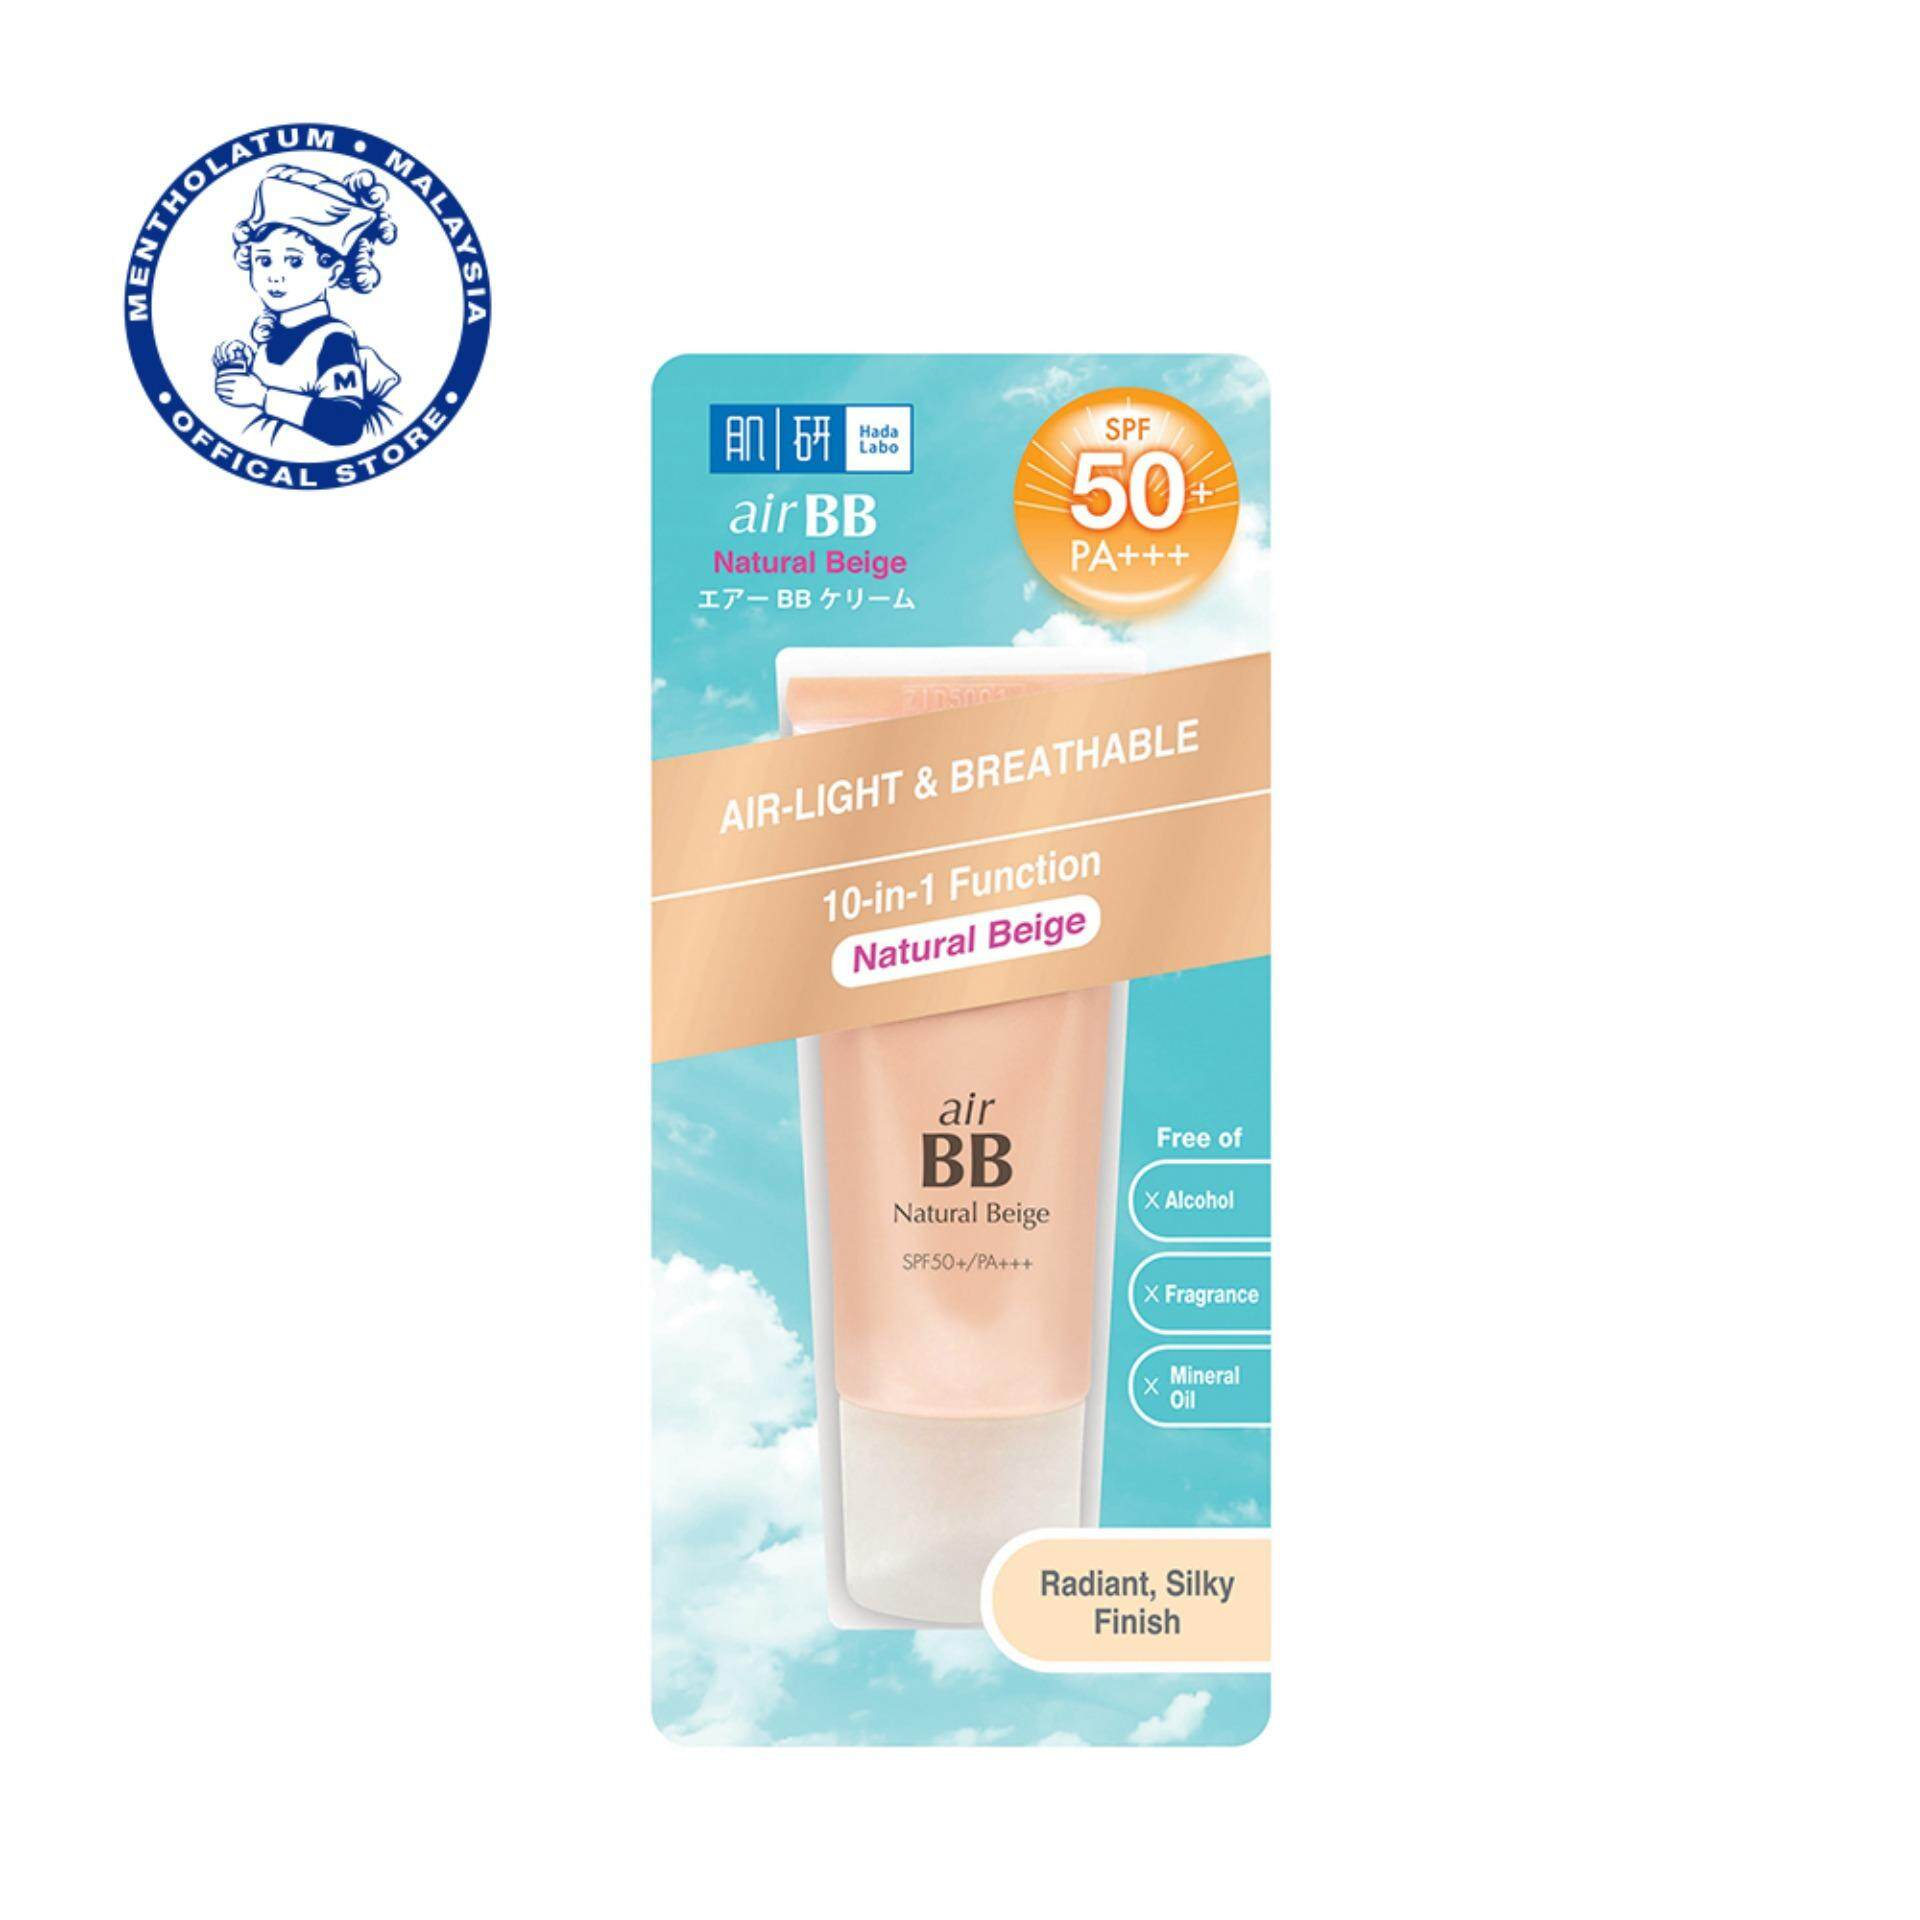 Fitur Emina Beauty Bliss Natural Bb Cream 20ml Kulit Hada Labo Air Beige 40g